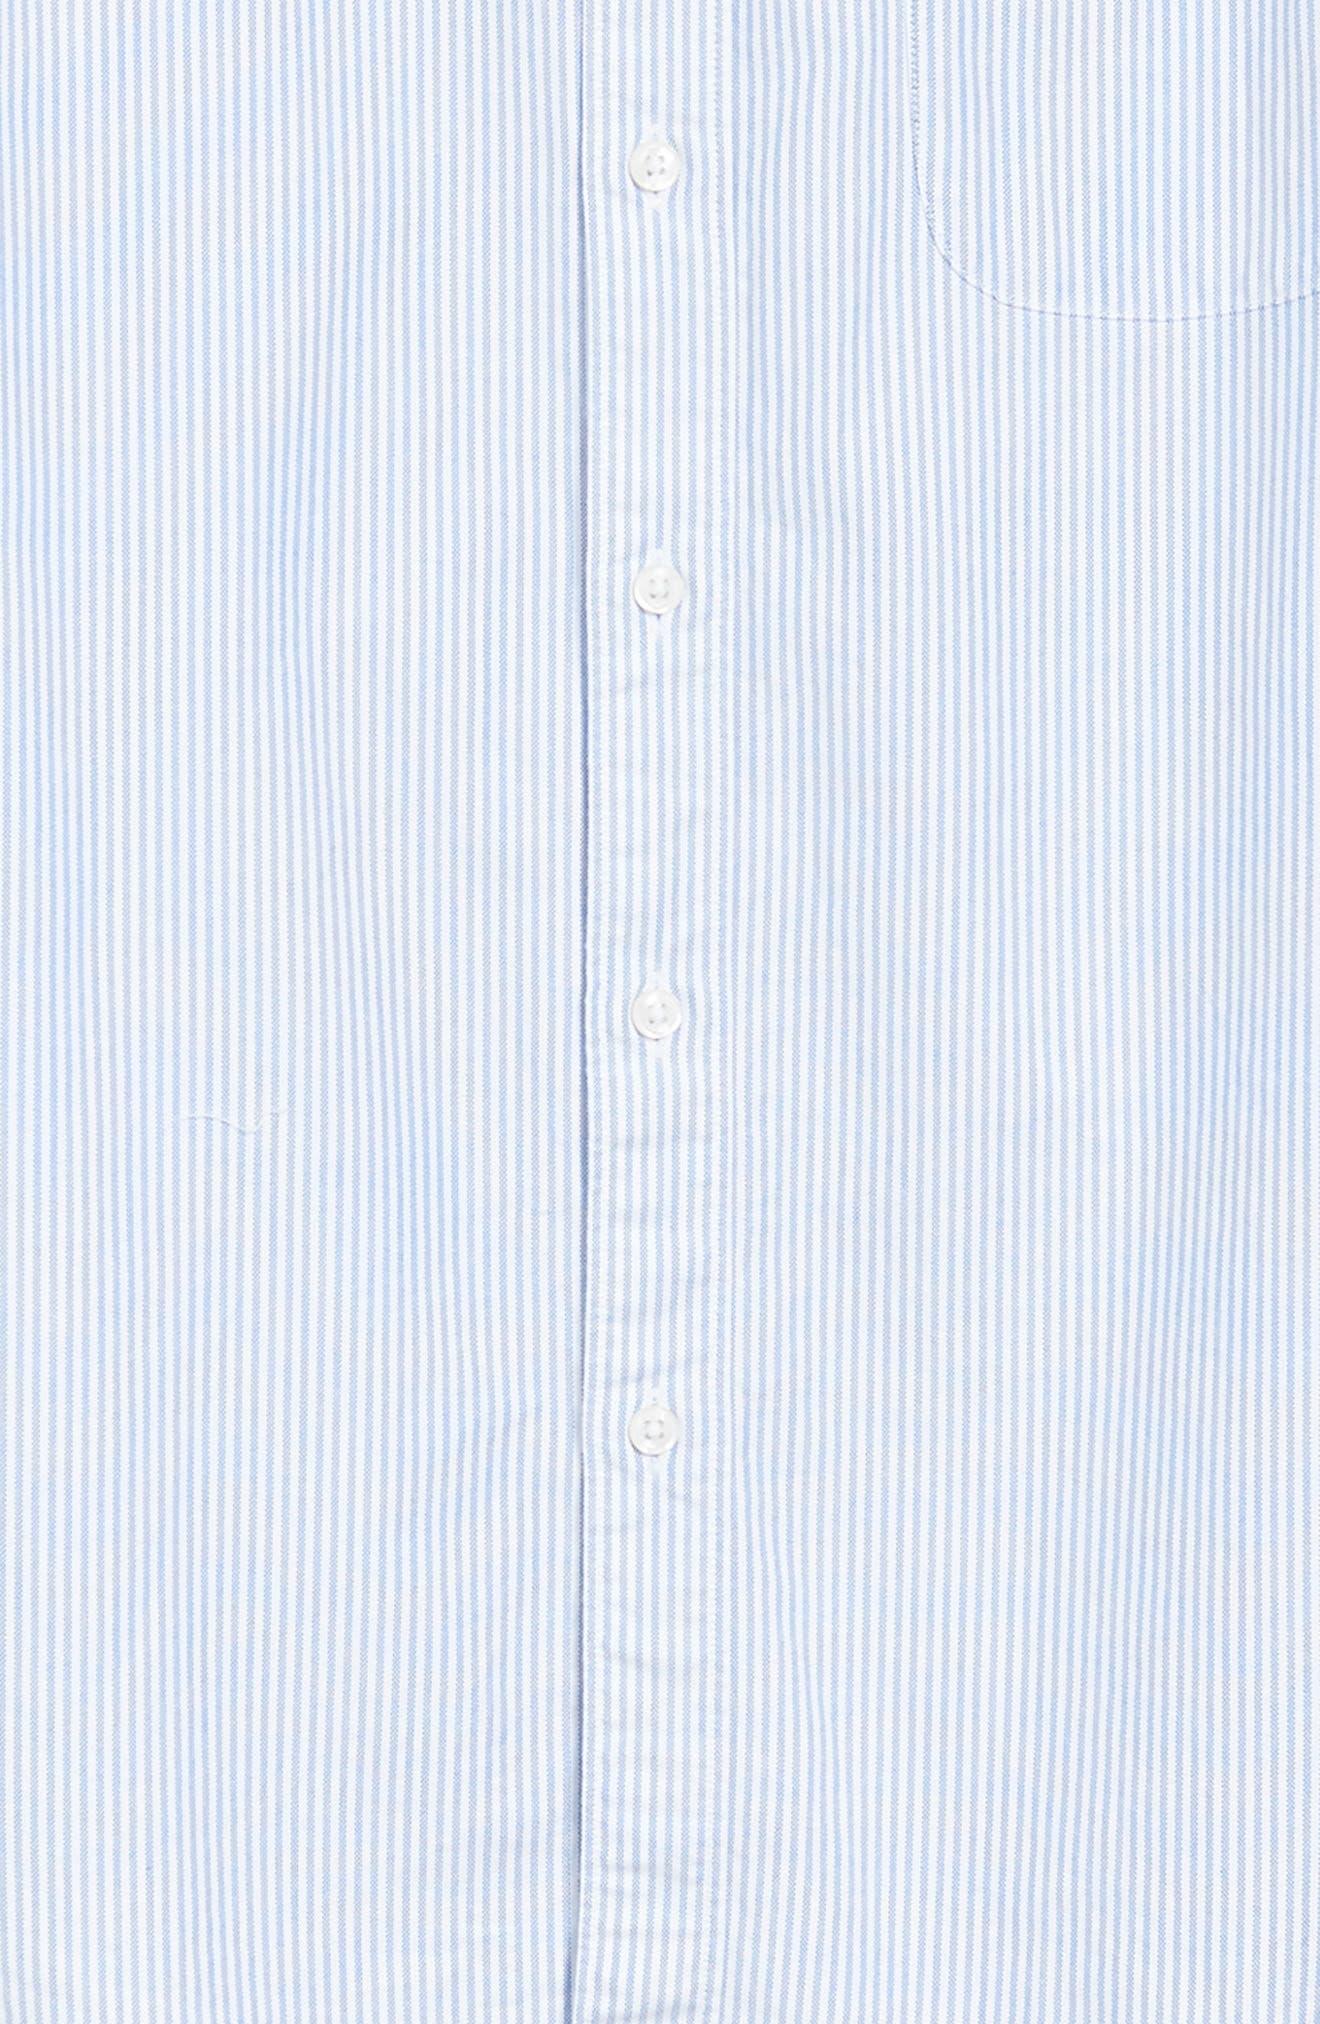 Stripe Pima Cotton Oxford Sport Shirt,                             Alternate thumbnail 6, color,                             RAINCOAT BLUE